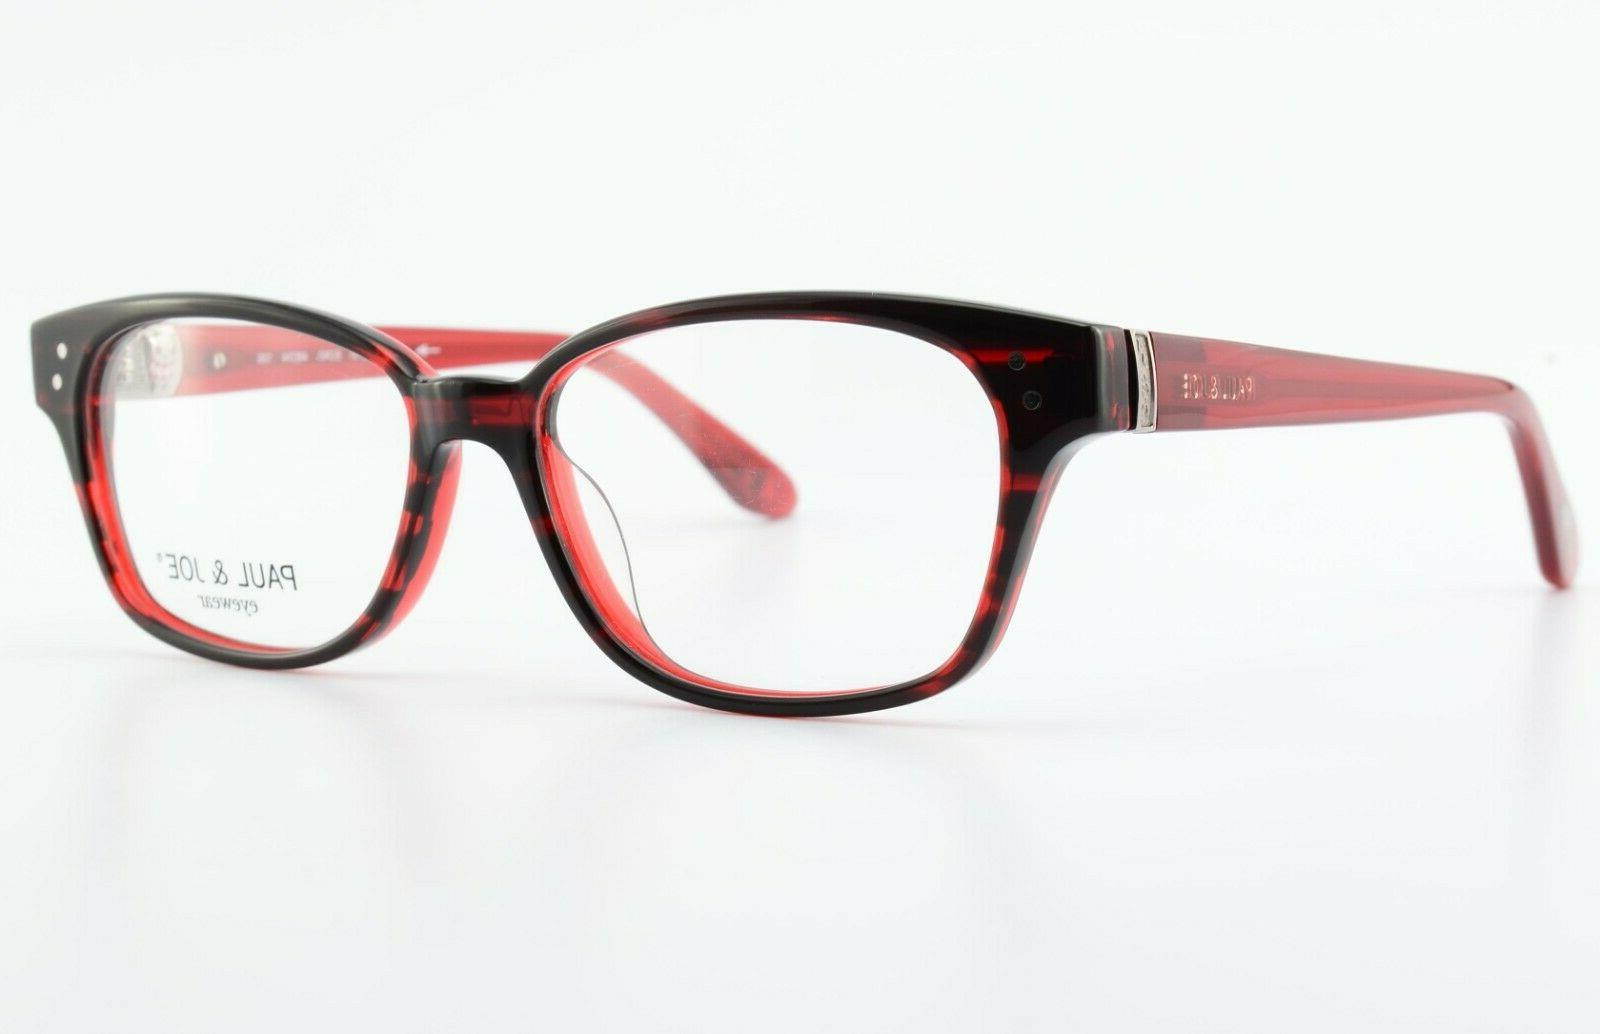 PAUL & JOE Glasses 49 14 Red Eye Woman